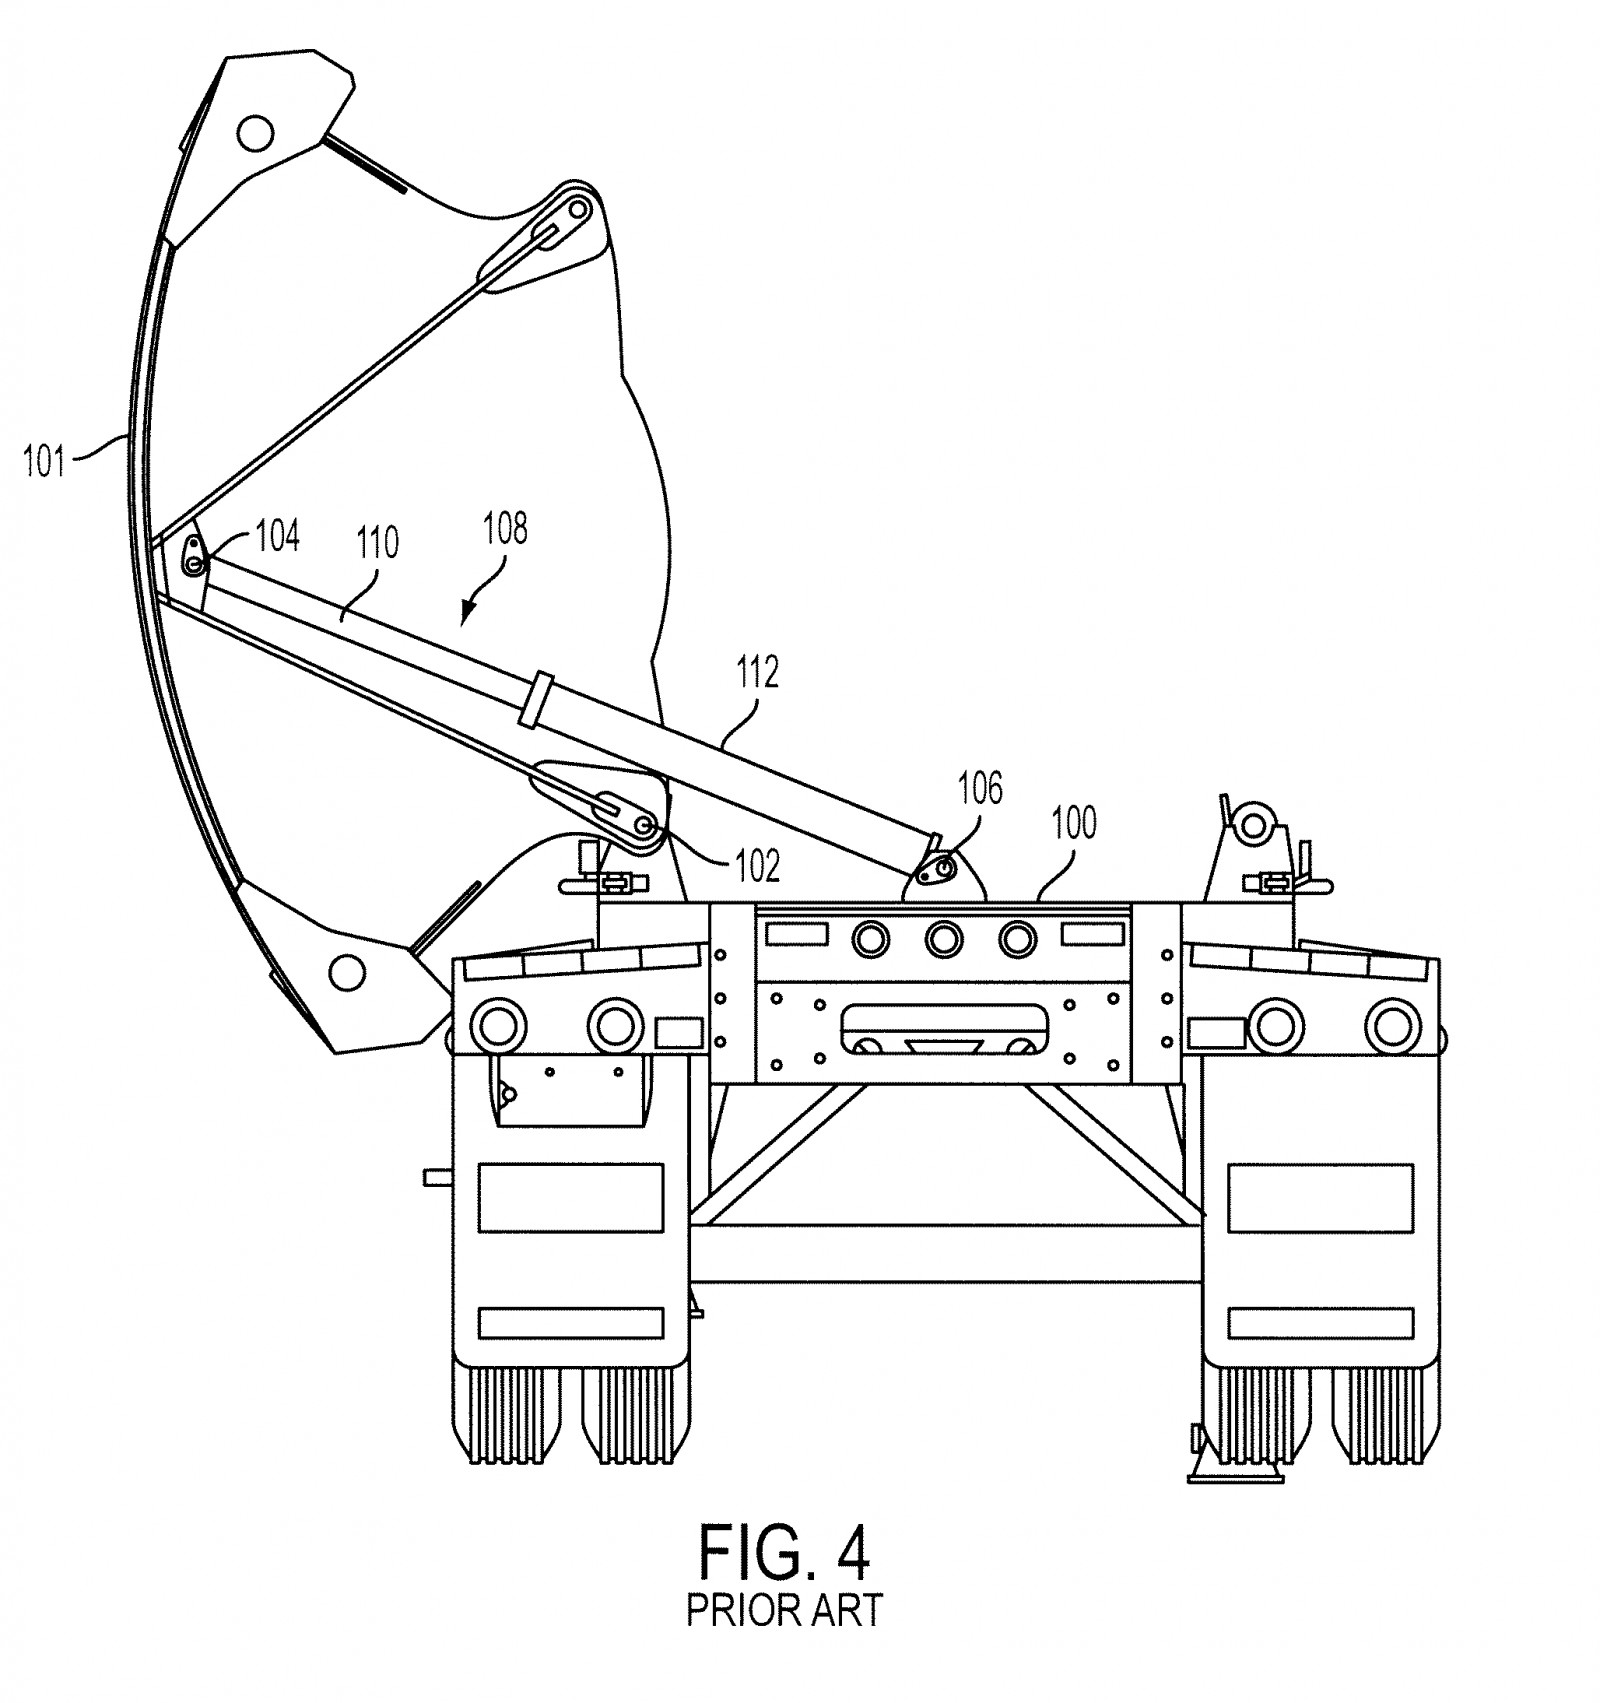 telephgone jack wiring diagram